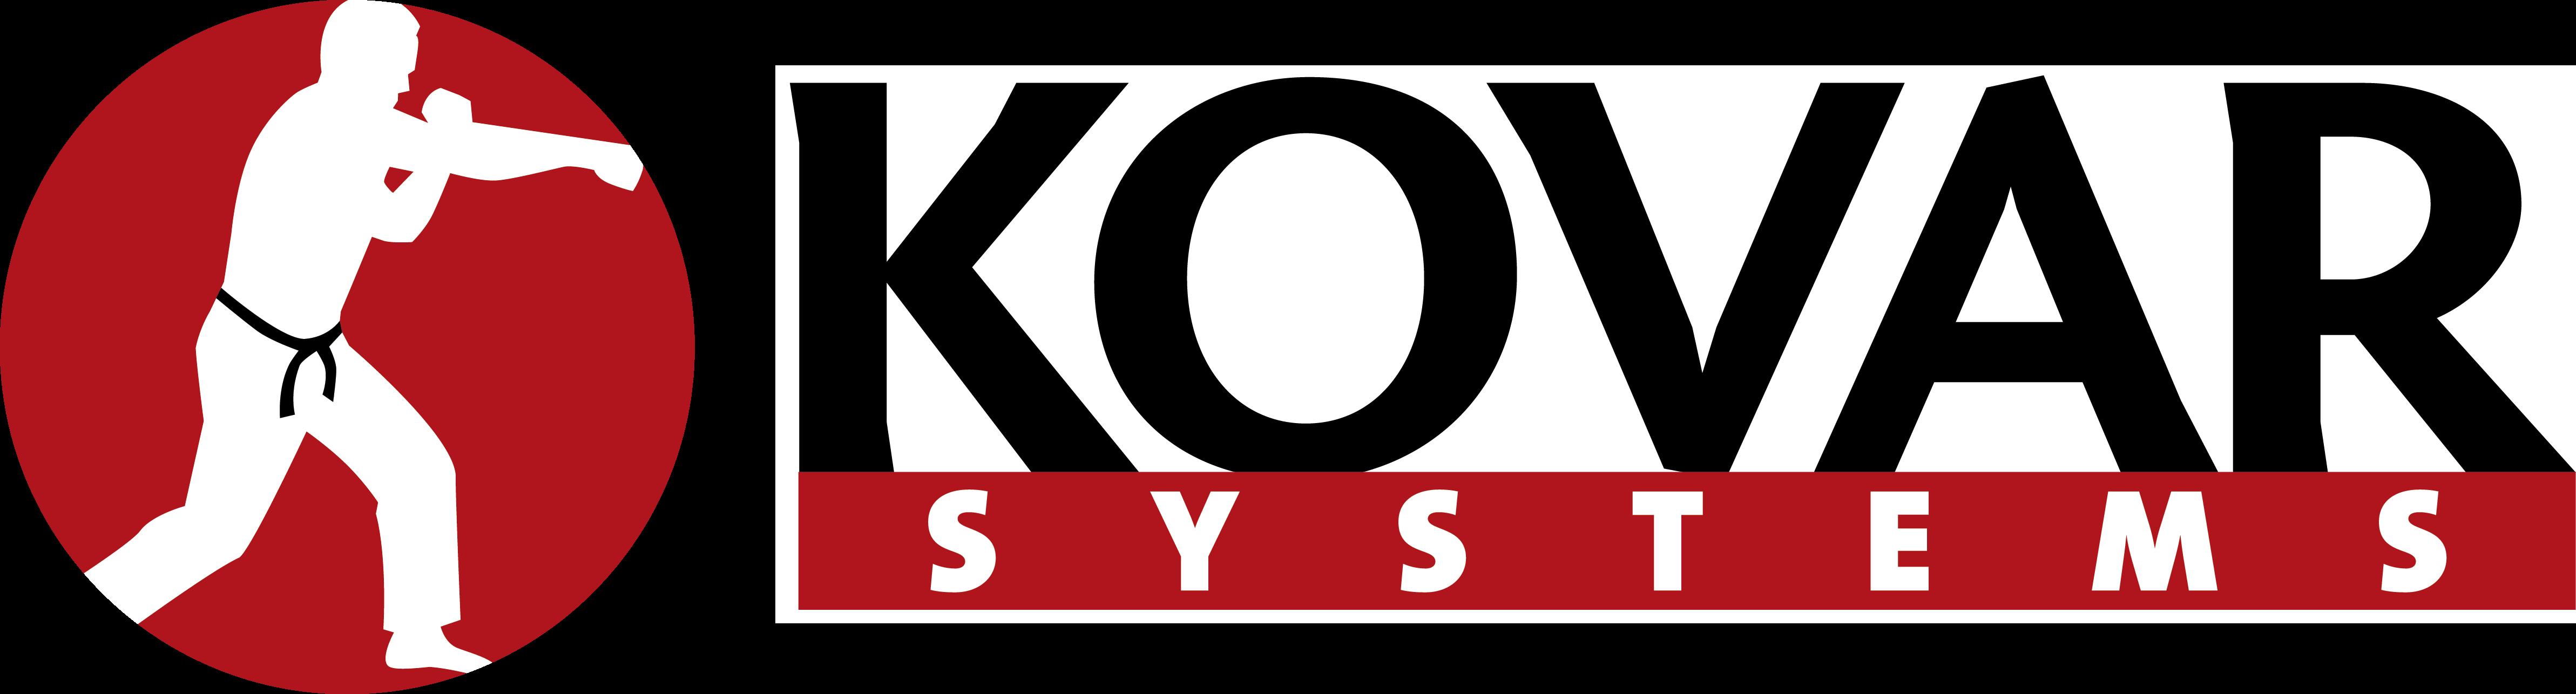 Kovar Systems Logo Horiz clear.png